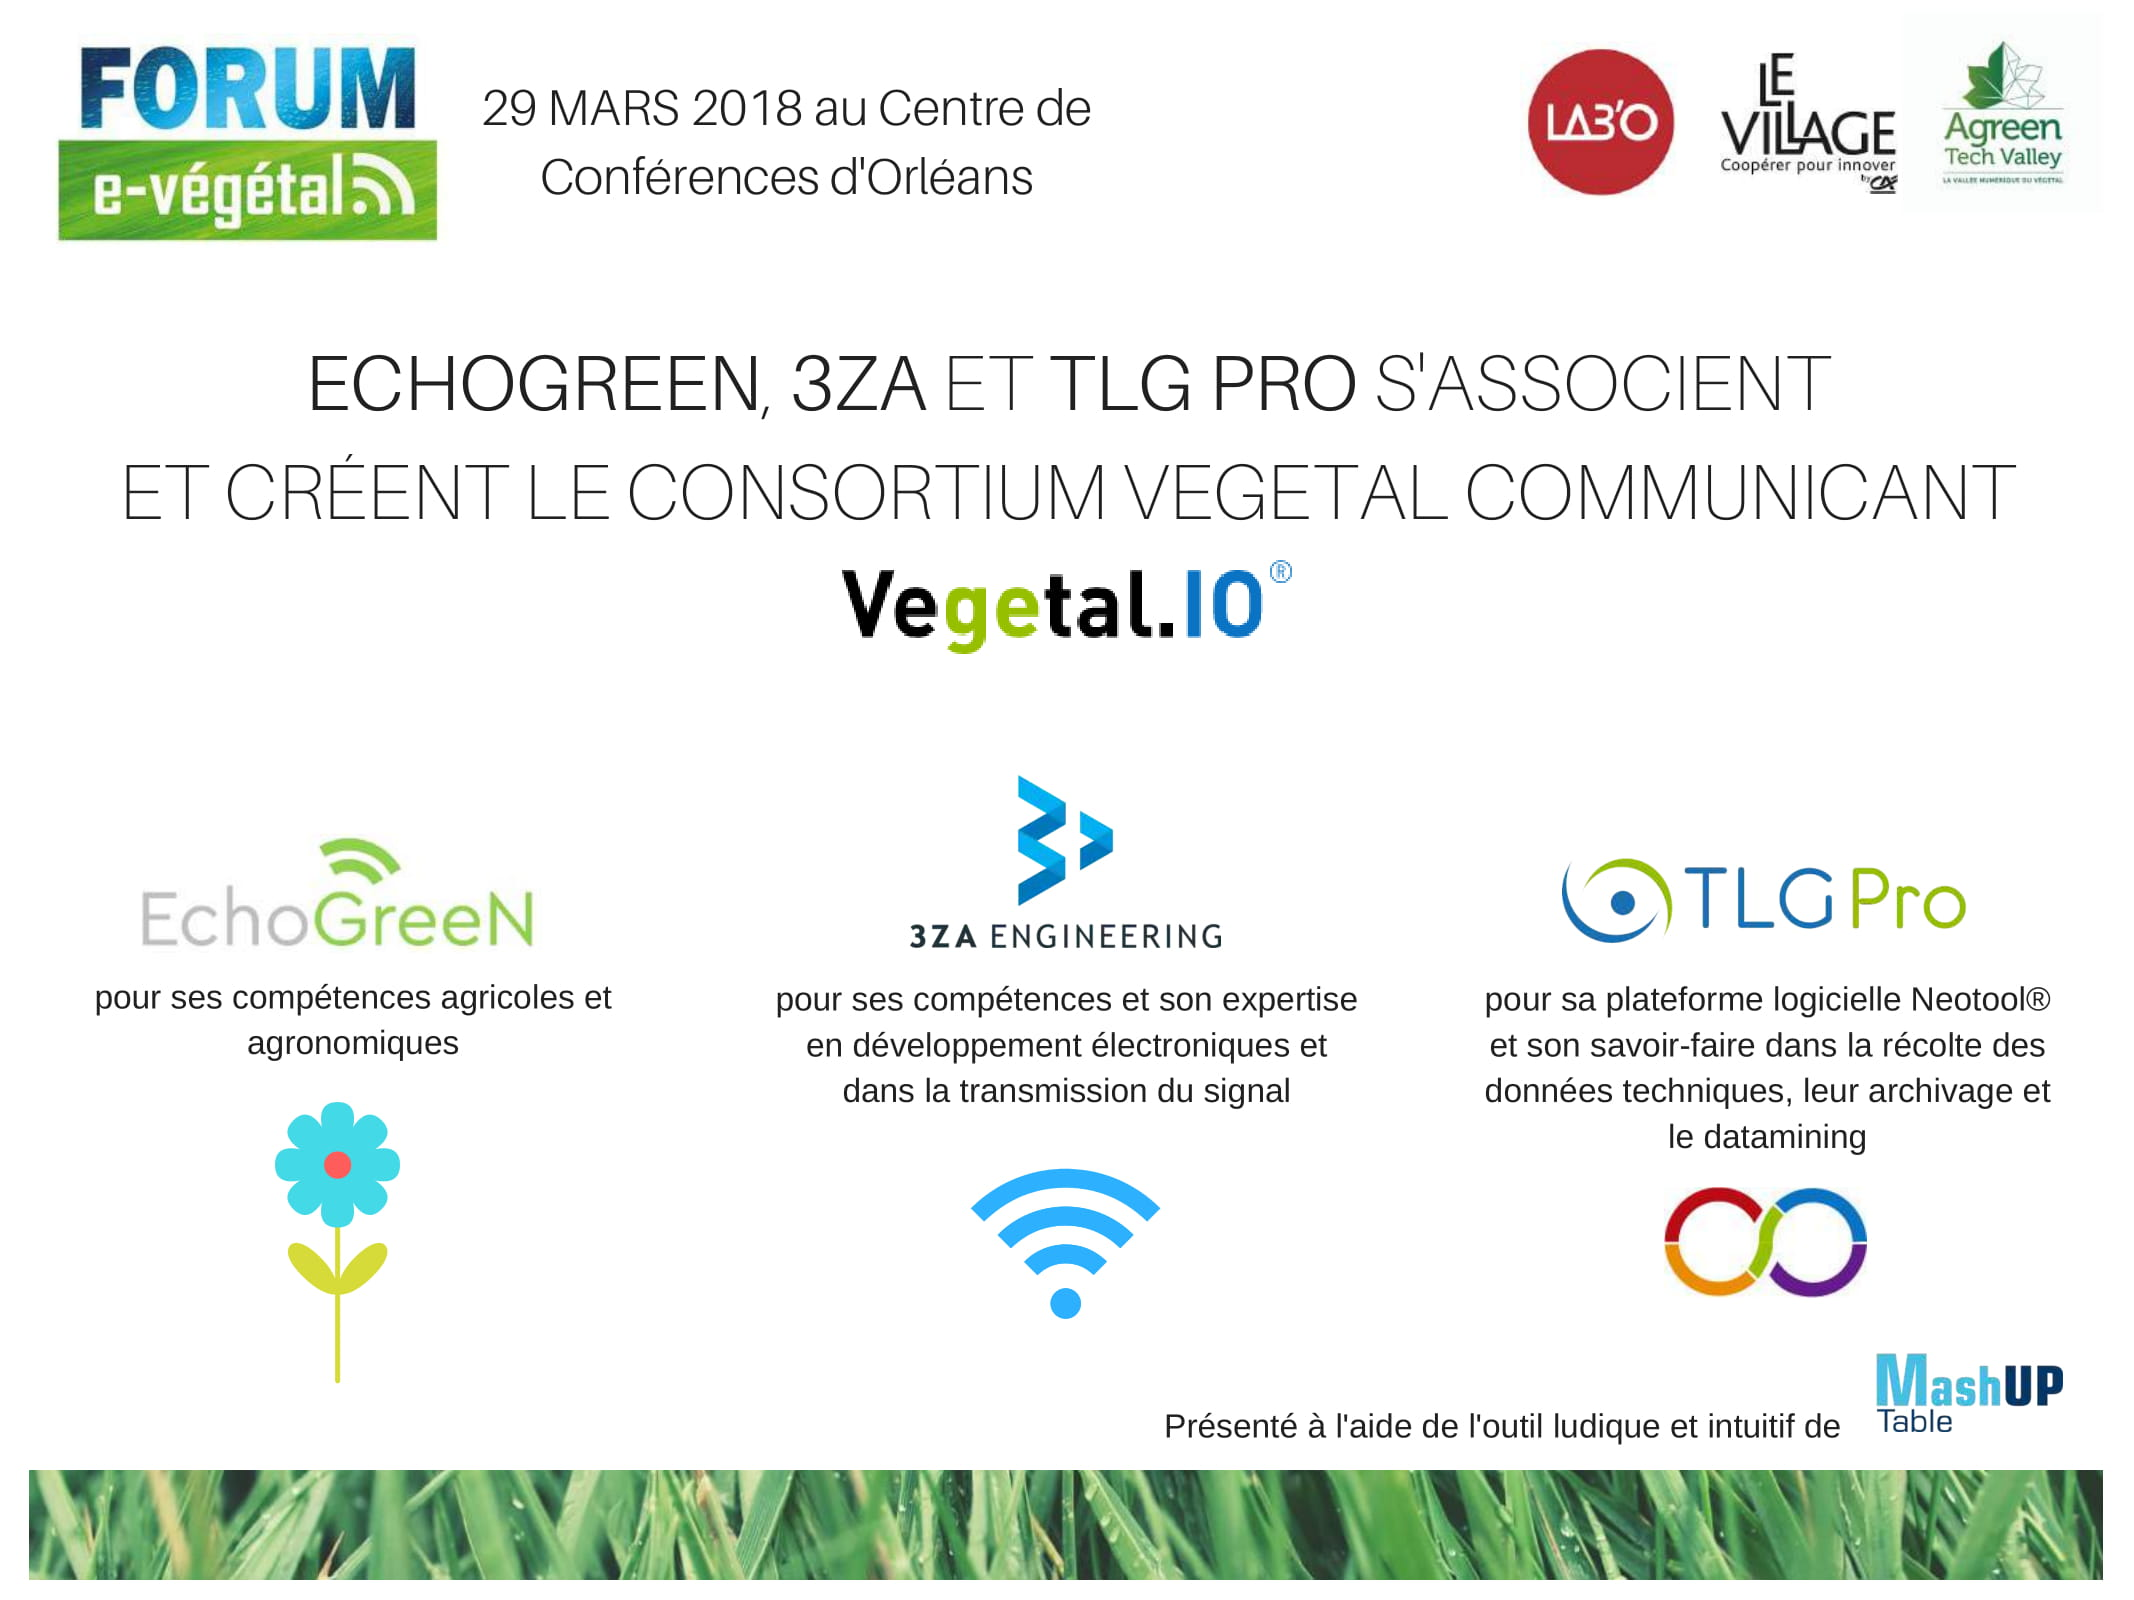 VEGETAL IO - TLG Pro